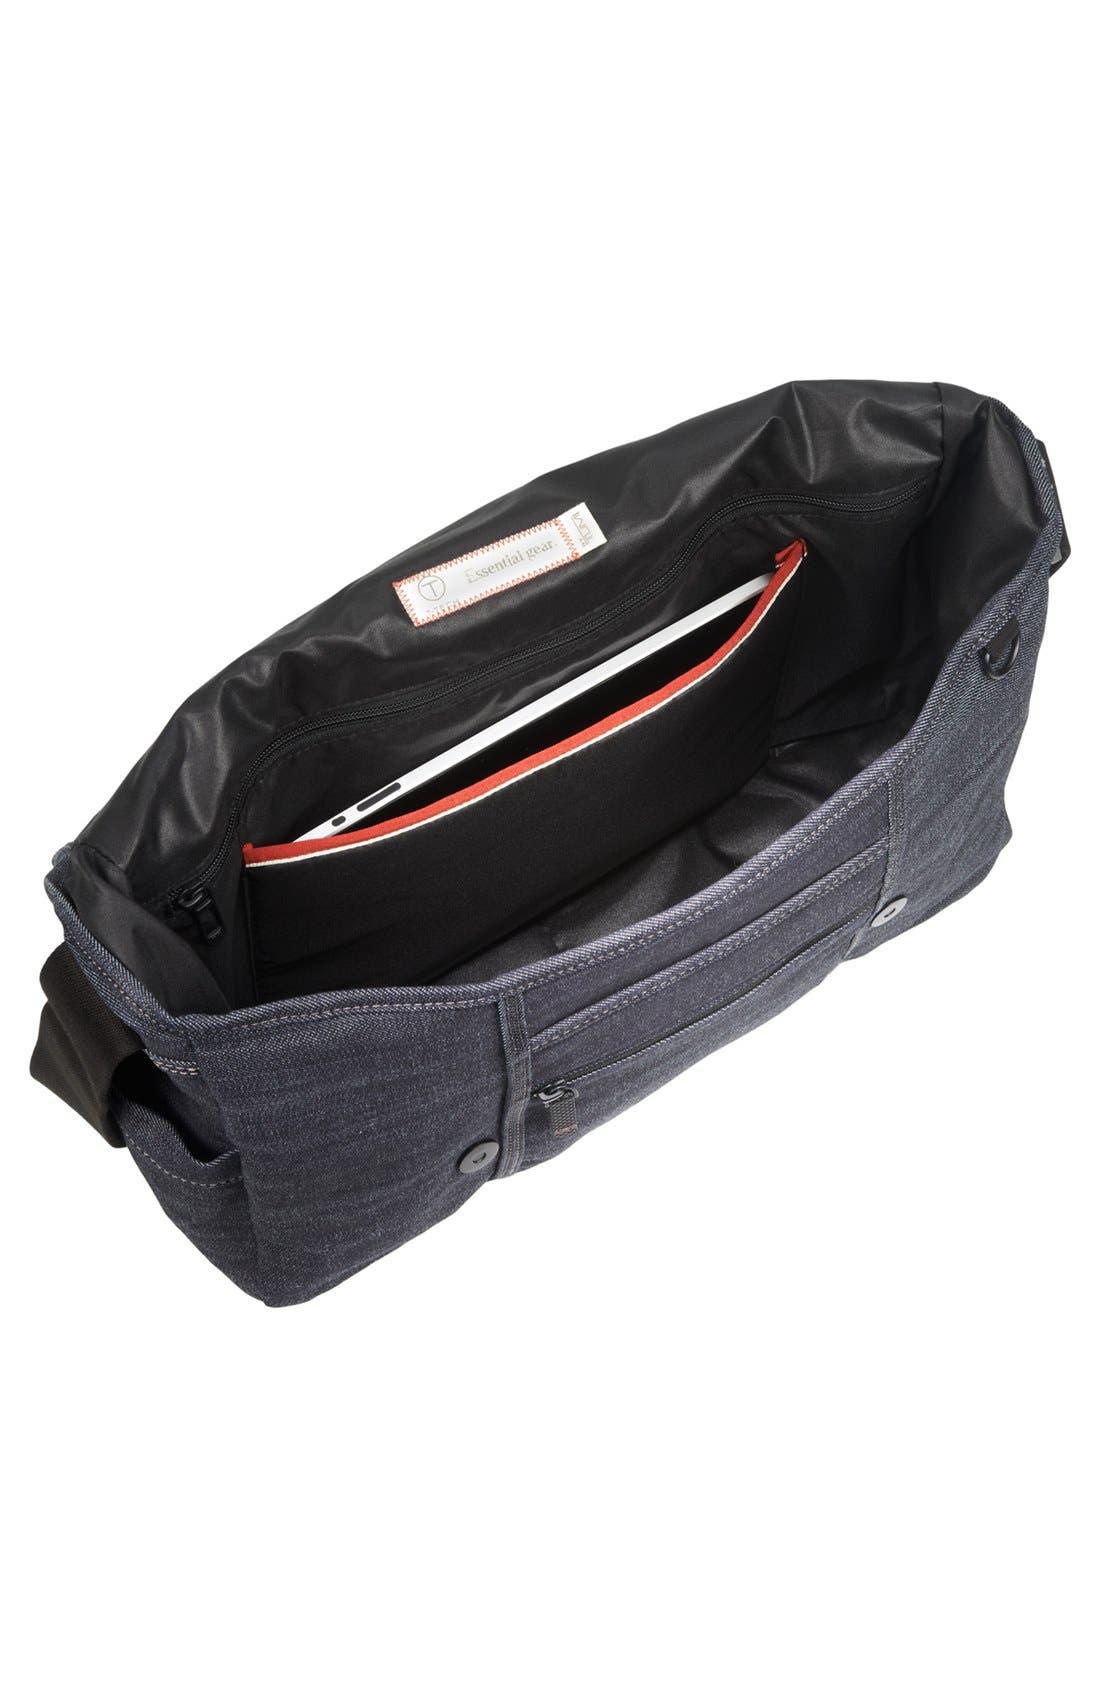 Alternate Image 3  - T-Tech by Tumi 'Icon - Usher' Messenger Bag